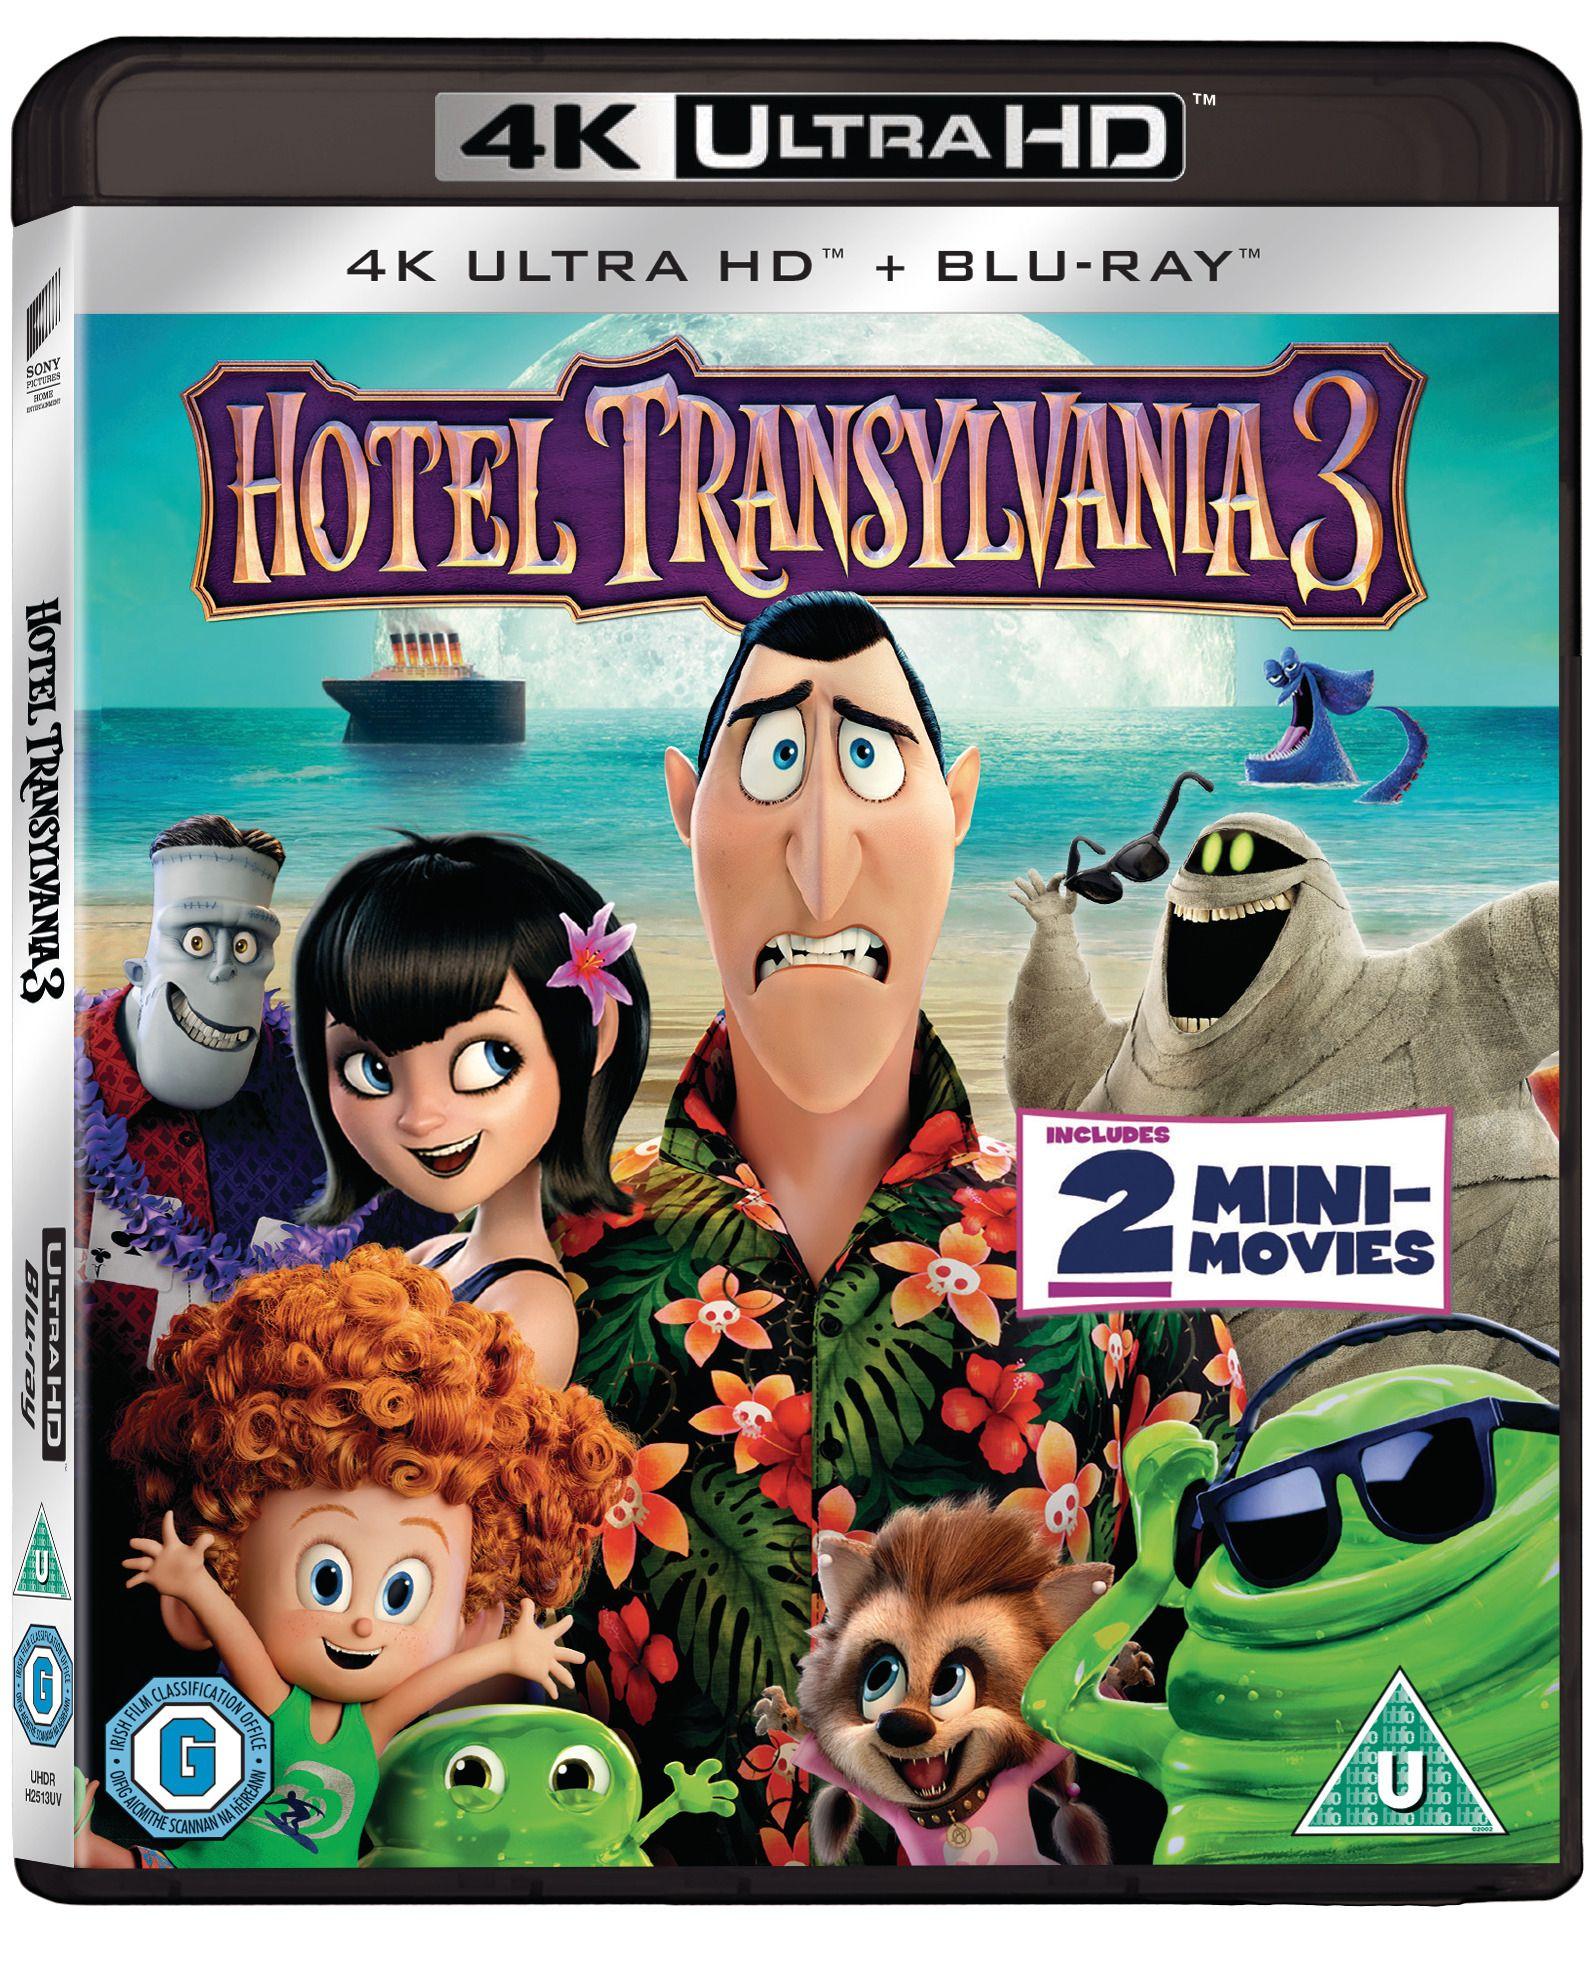 Hotel Transylvania 3 4k UHD + blu ray £8.49 @ HMV (Free click and collect)